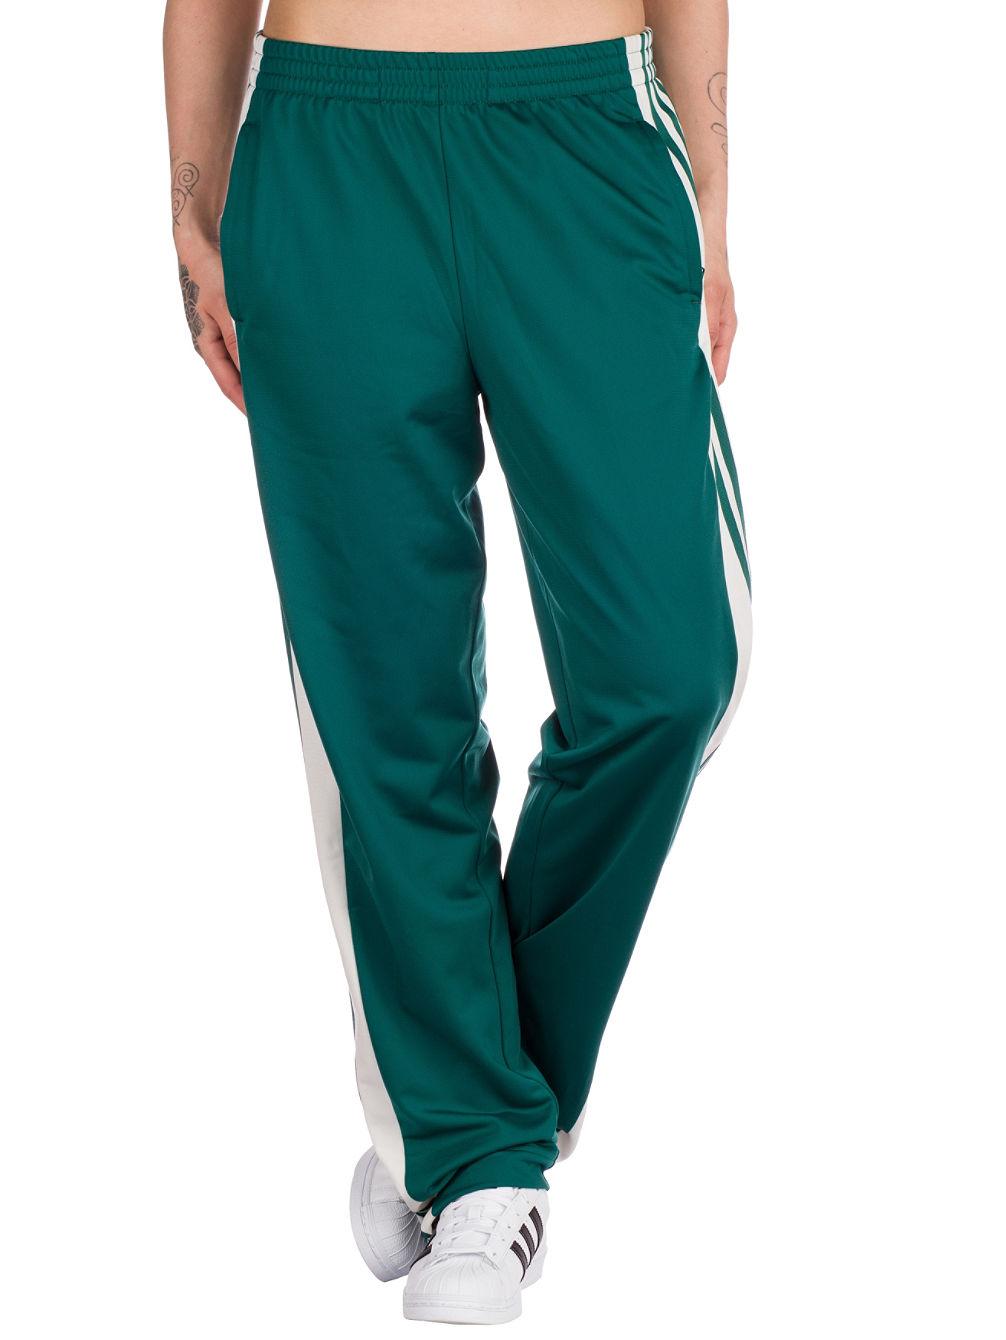 a279b9c86 Buy adidas Originals Adibreak Track Jogging Pants online at Blue Tomato